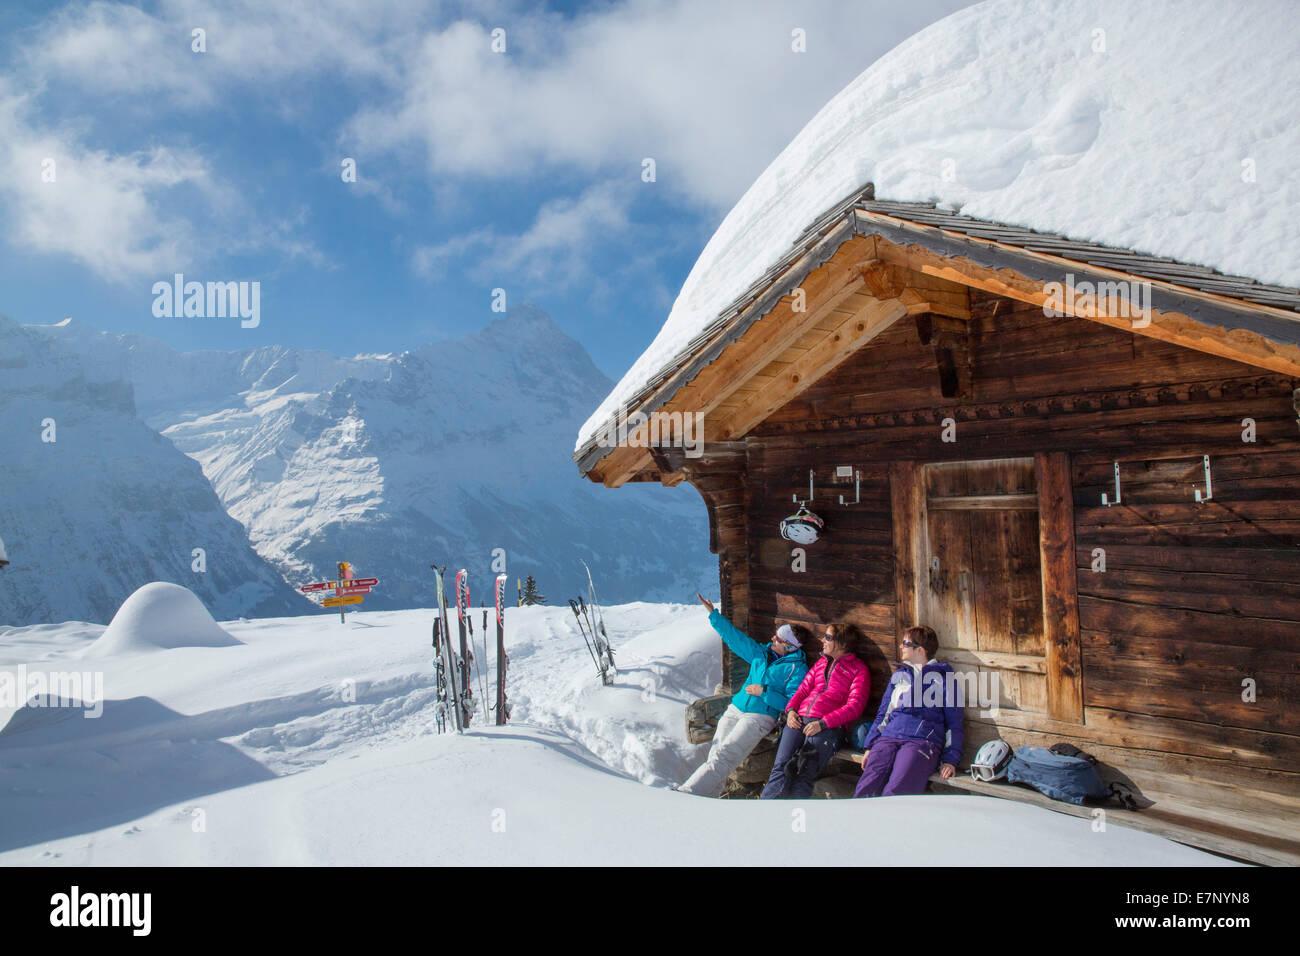 Ski, station touristique, Grindelwald, Ridge, Eigers, montagne, montagnes, ski, ski de fond, carving, hiver, sports Photo Stock